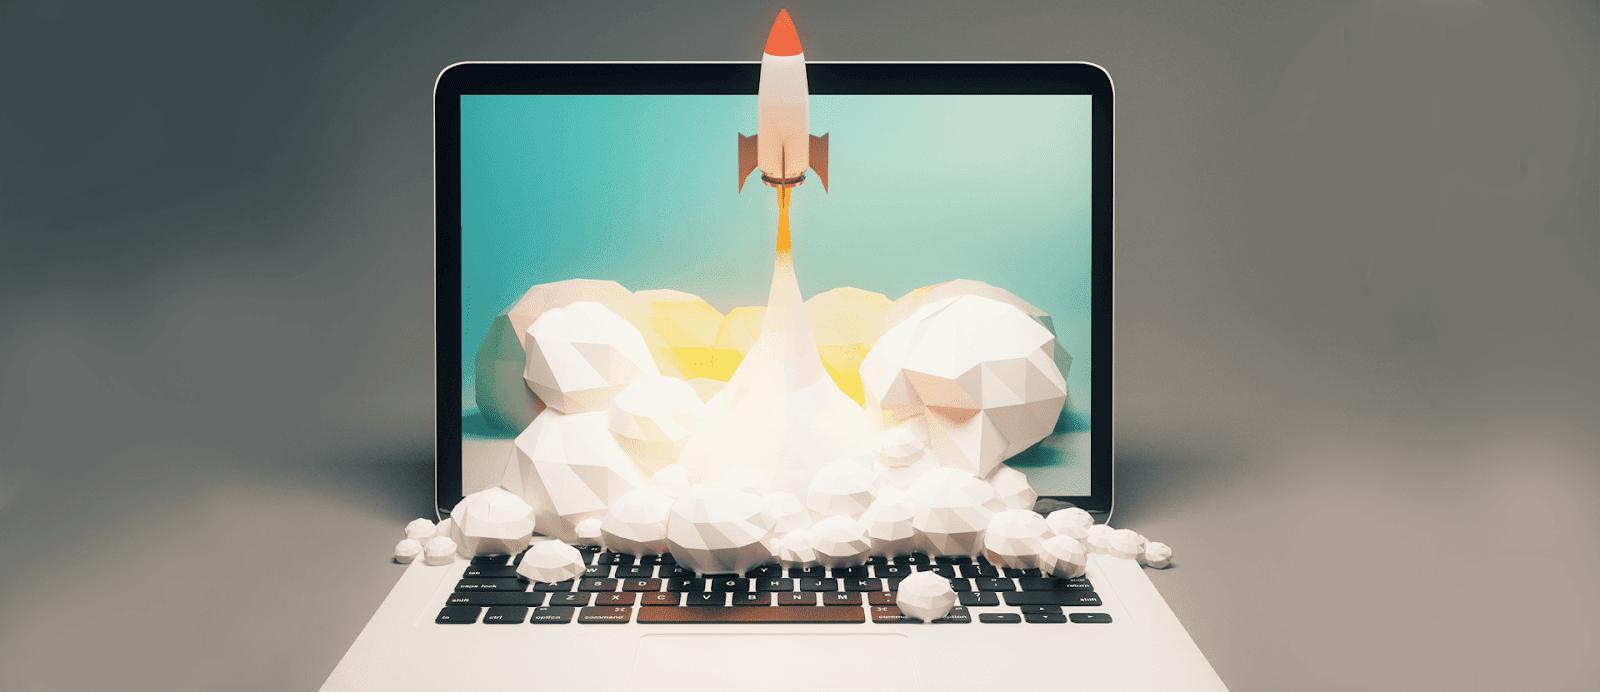 5 tips yang Perlu Diperhatikan untuk Launching Produk via Webinar